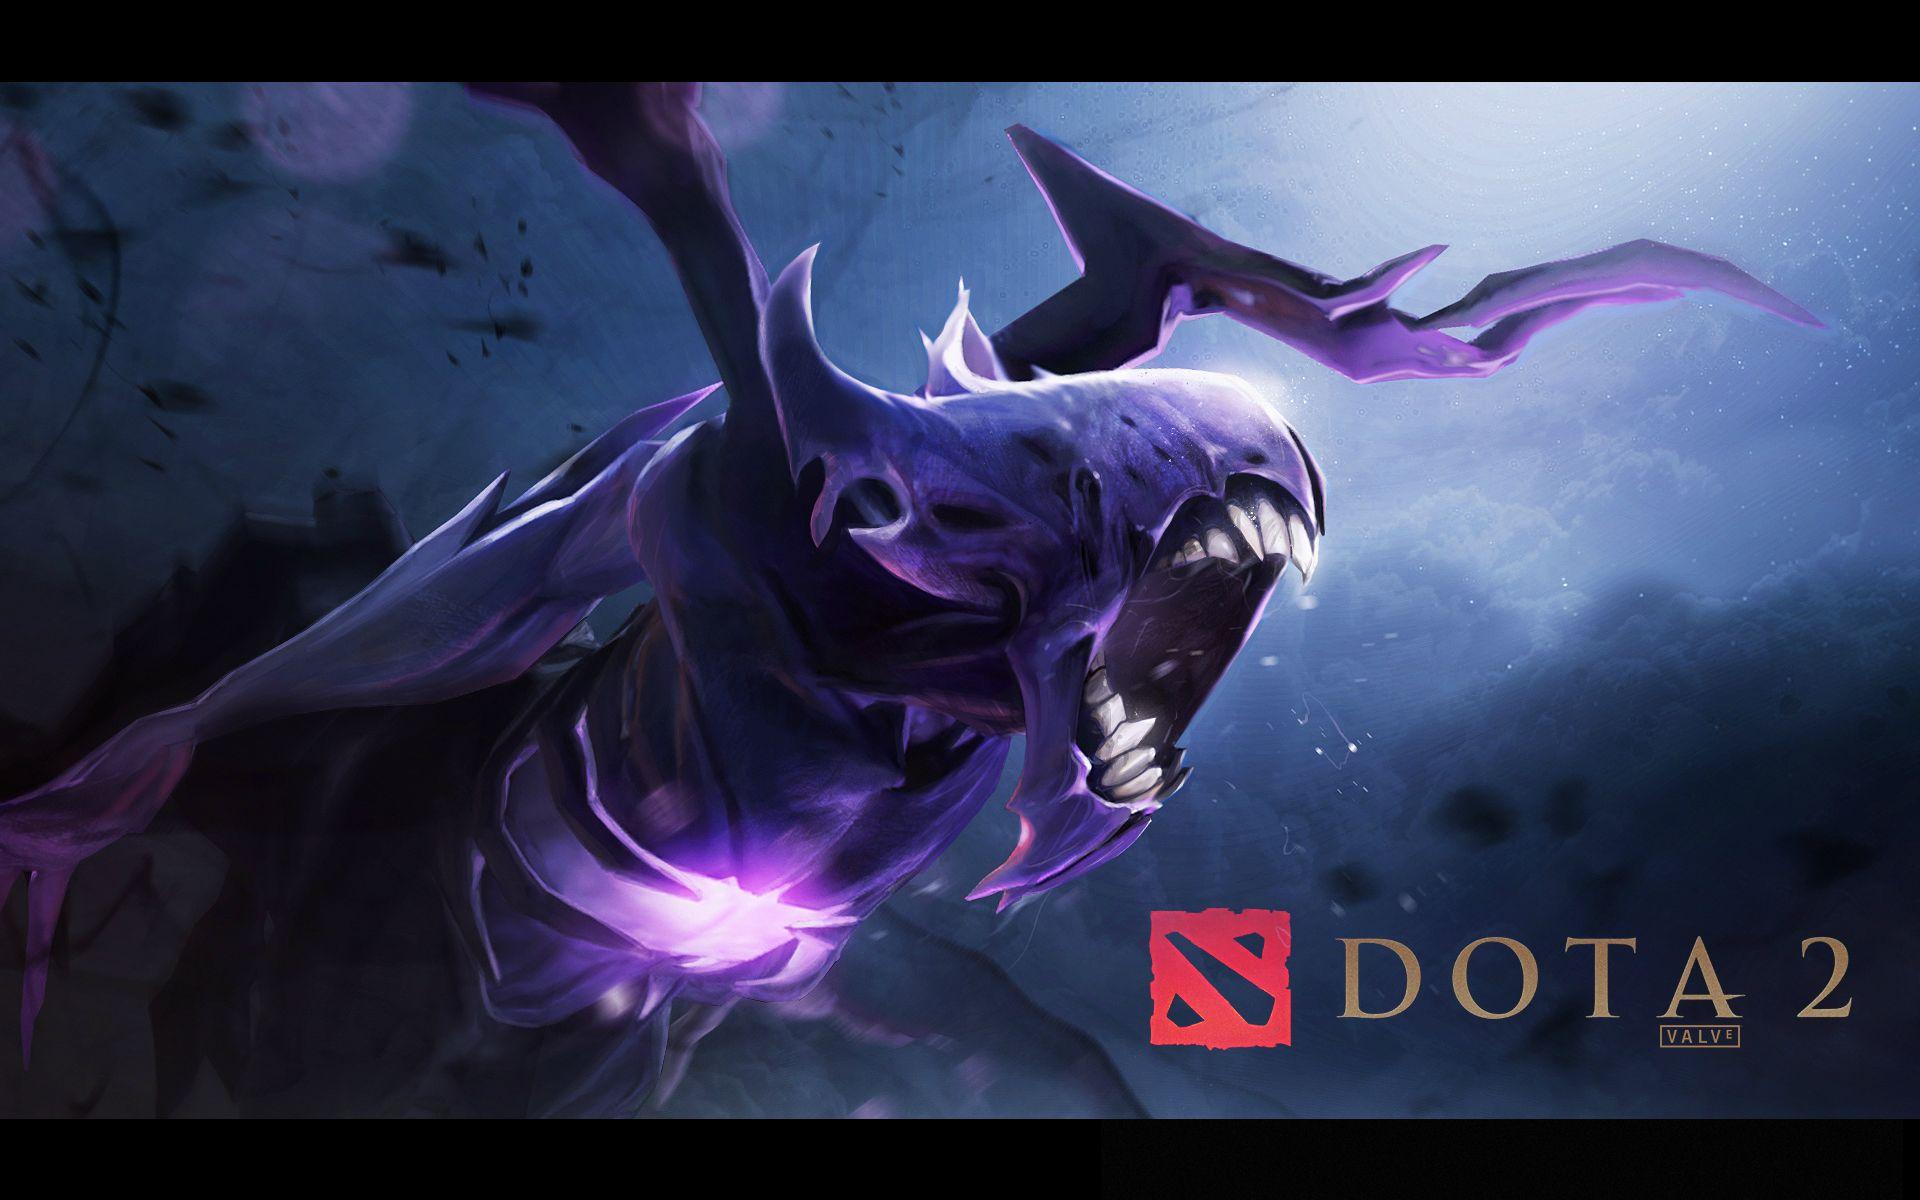 Dota 2 Hd Wallpaper - Bane Art Dota 2 , HD Wallpaper & Backgrounds